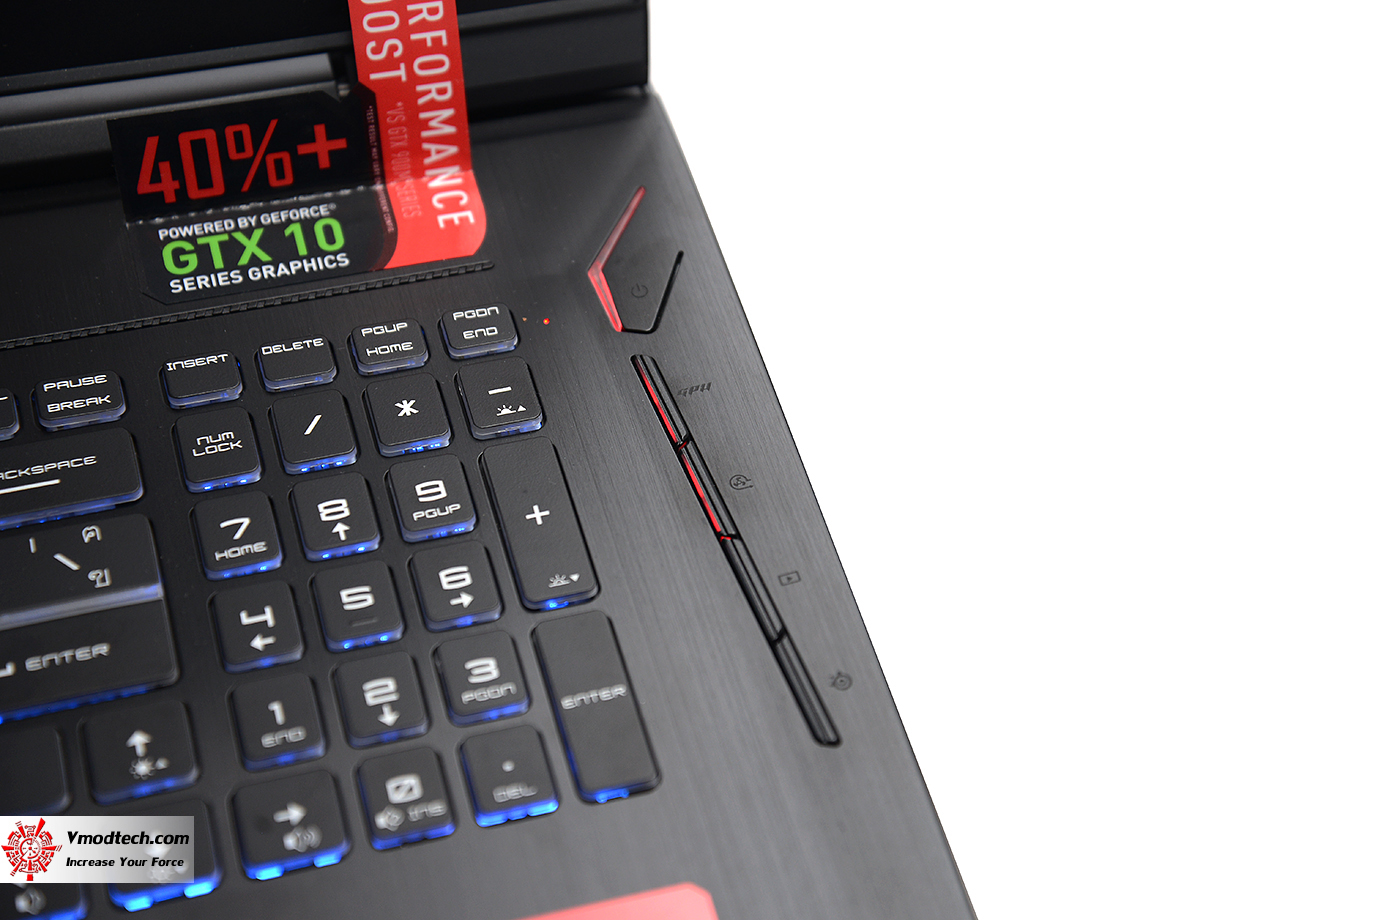 dsc 4864 MSI GT73VR 6RF Titan Pro Review